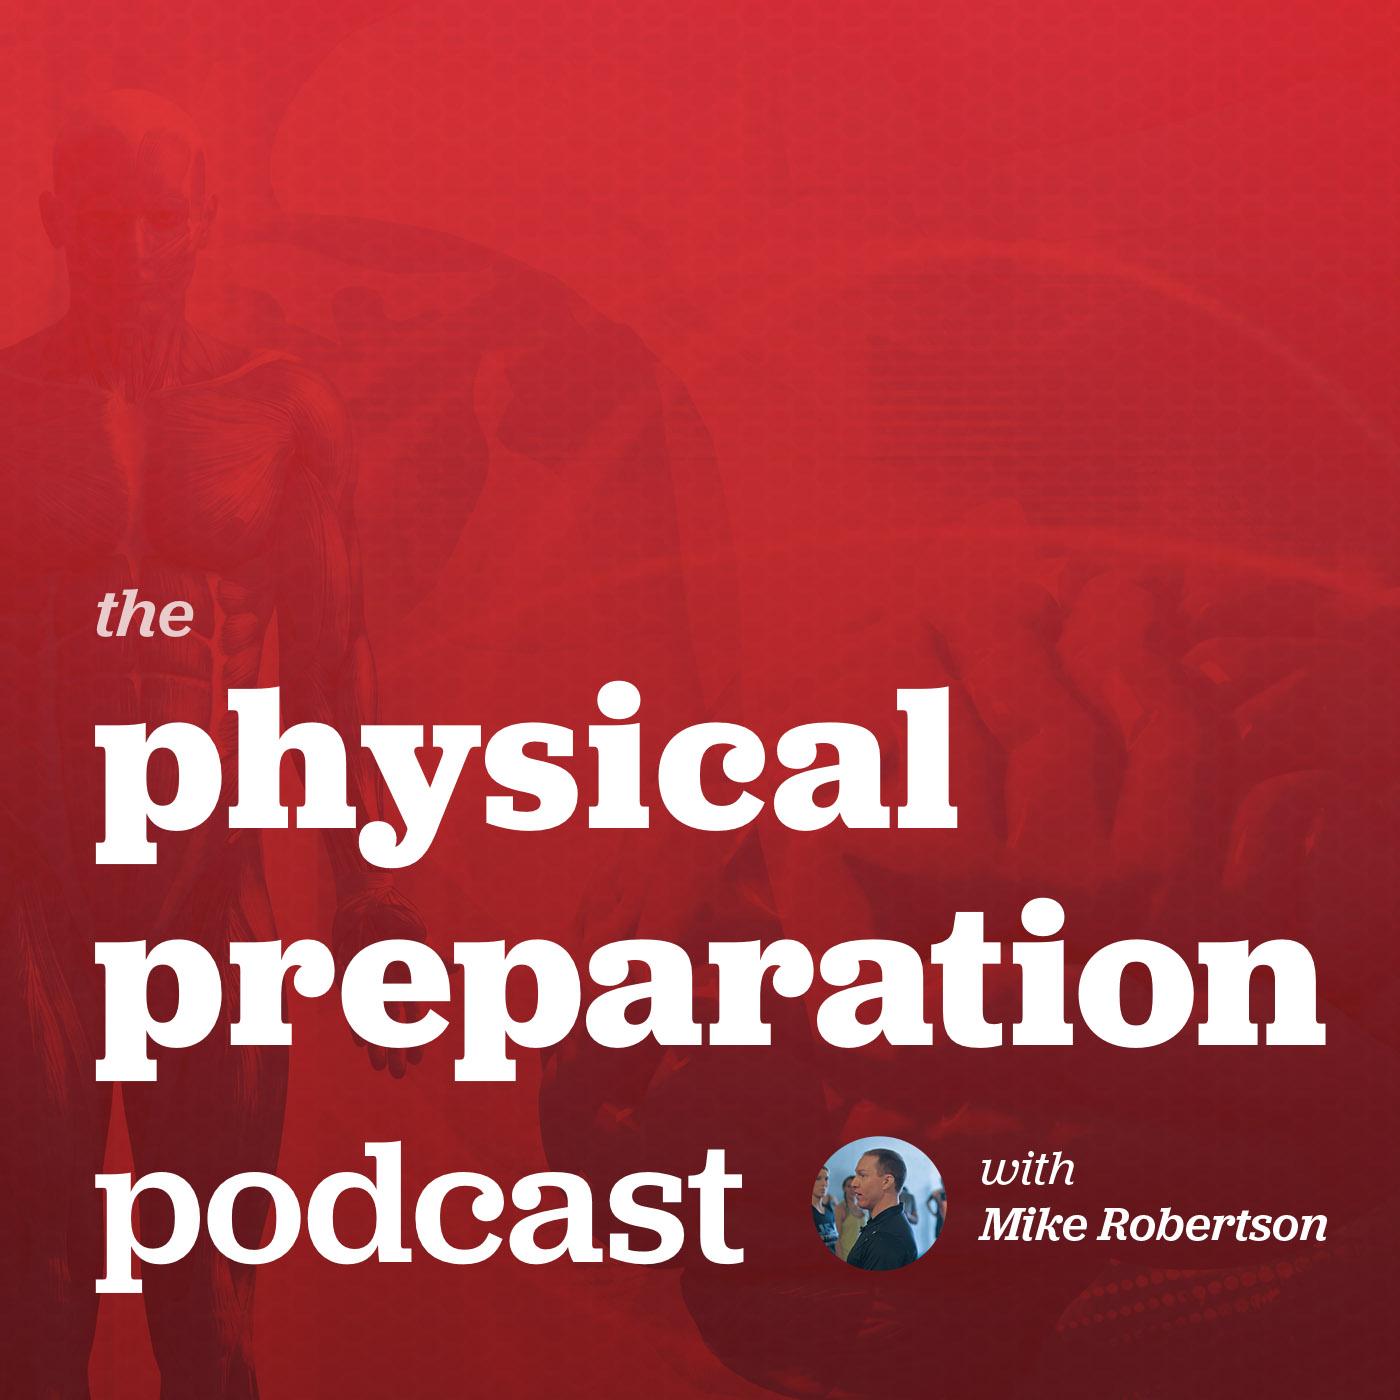 Physical Preparation Podcast Artwork.jpg